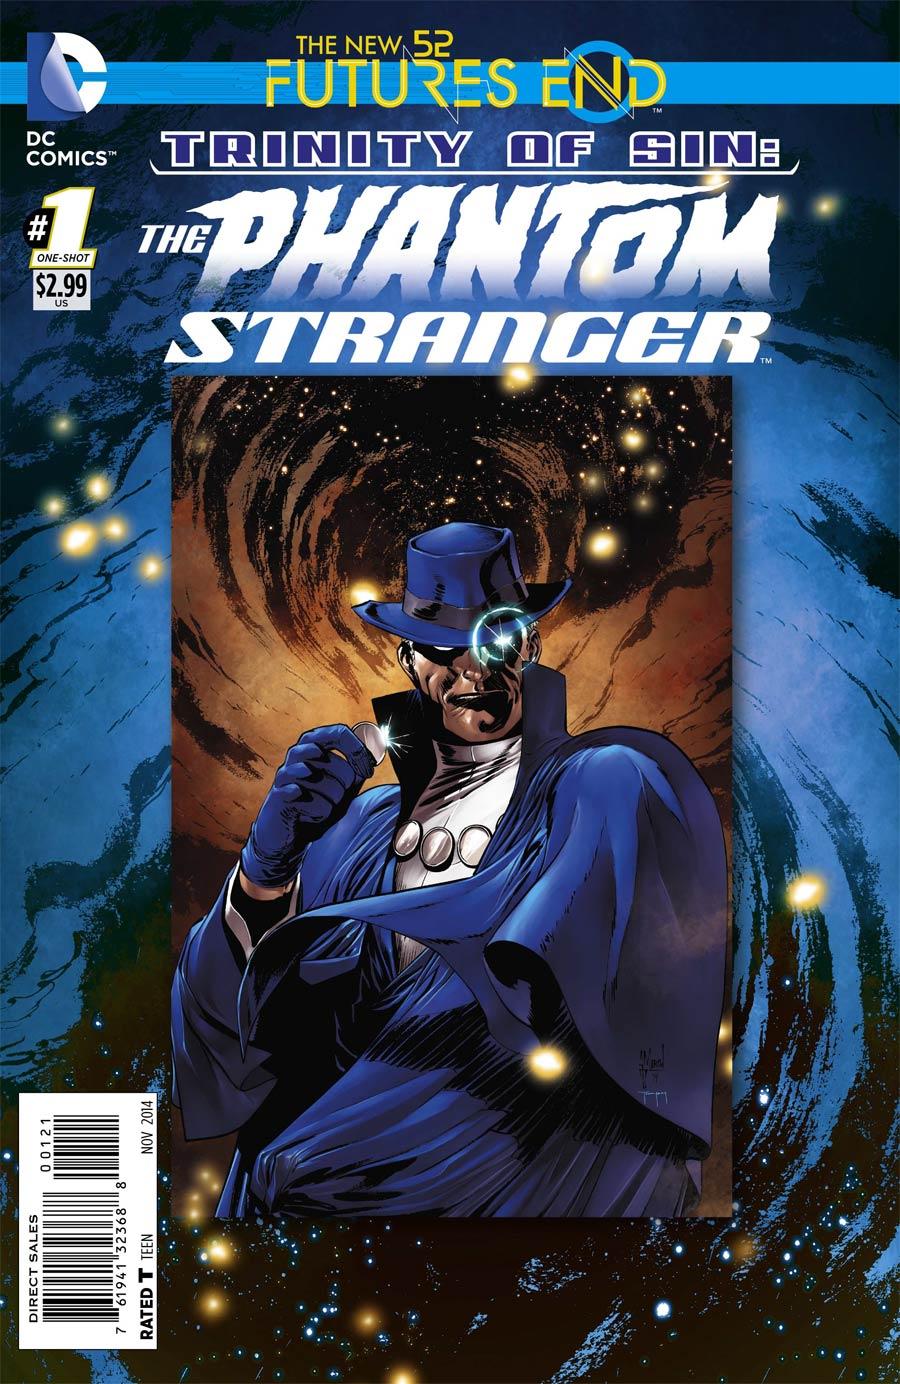 Trinity Of Sin Phantom Stranger Futures End #1 Cover B Standard Cover